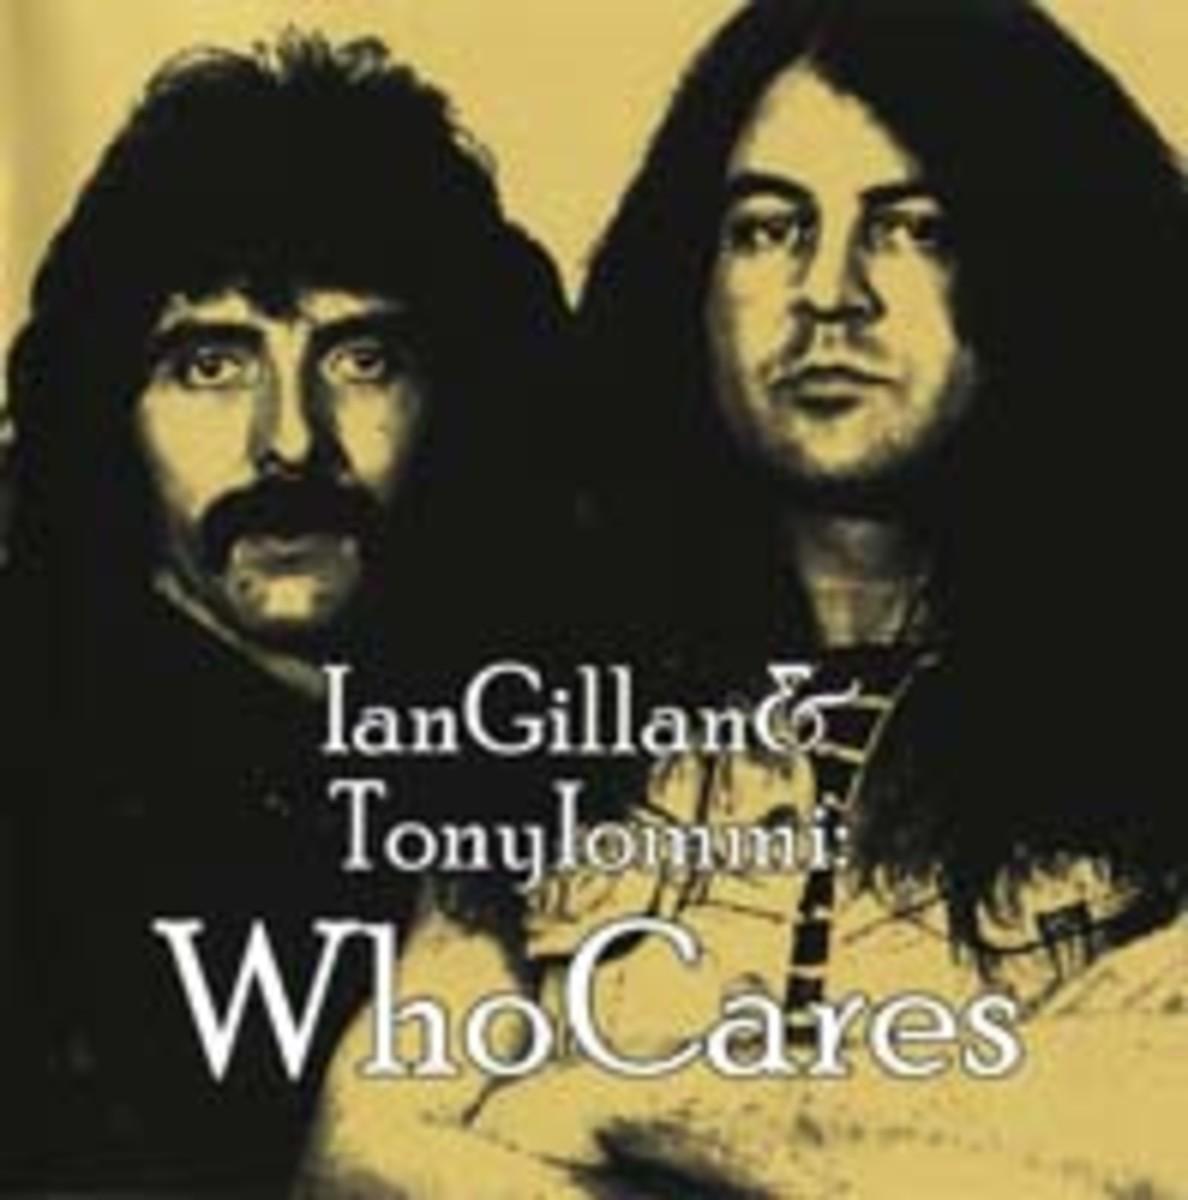 Tony Iommi and Ian Gillan Who Cares